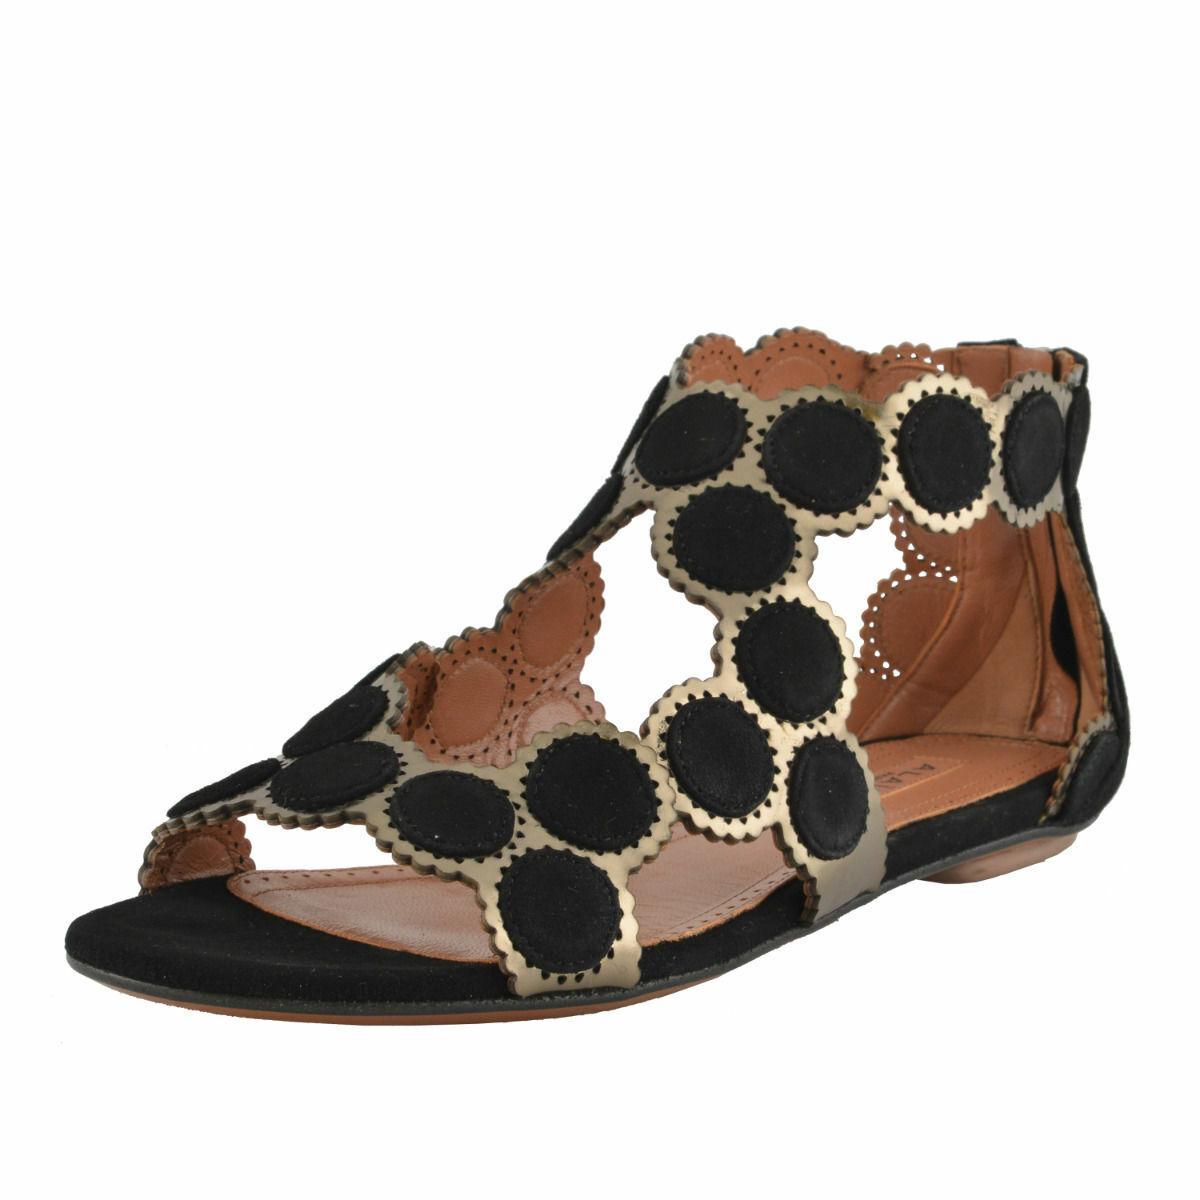 Alaïa Para Mujer Gamuza De Cuero Correa de tobillo Sandalias Zapatos